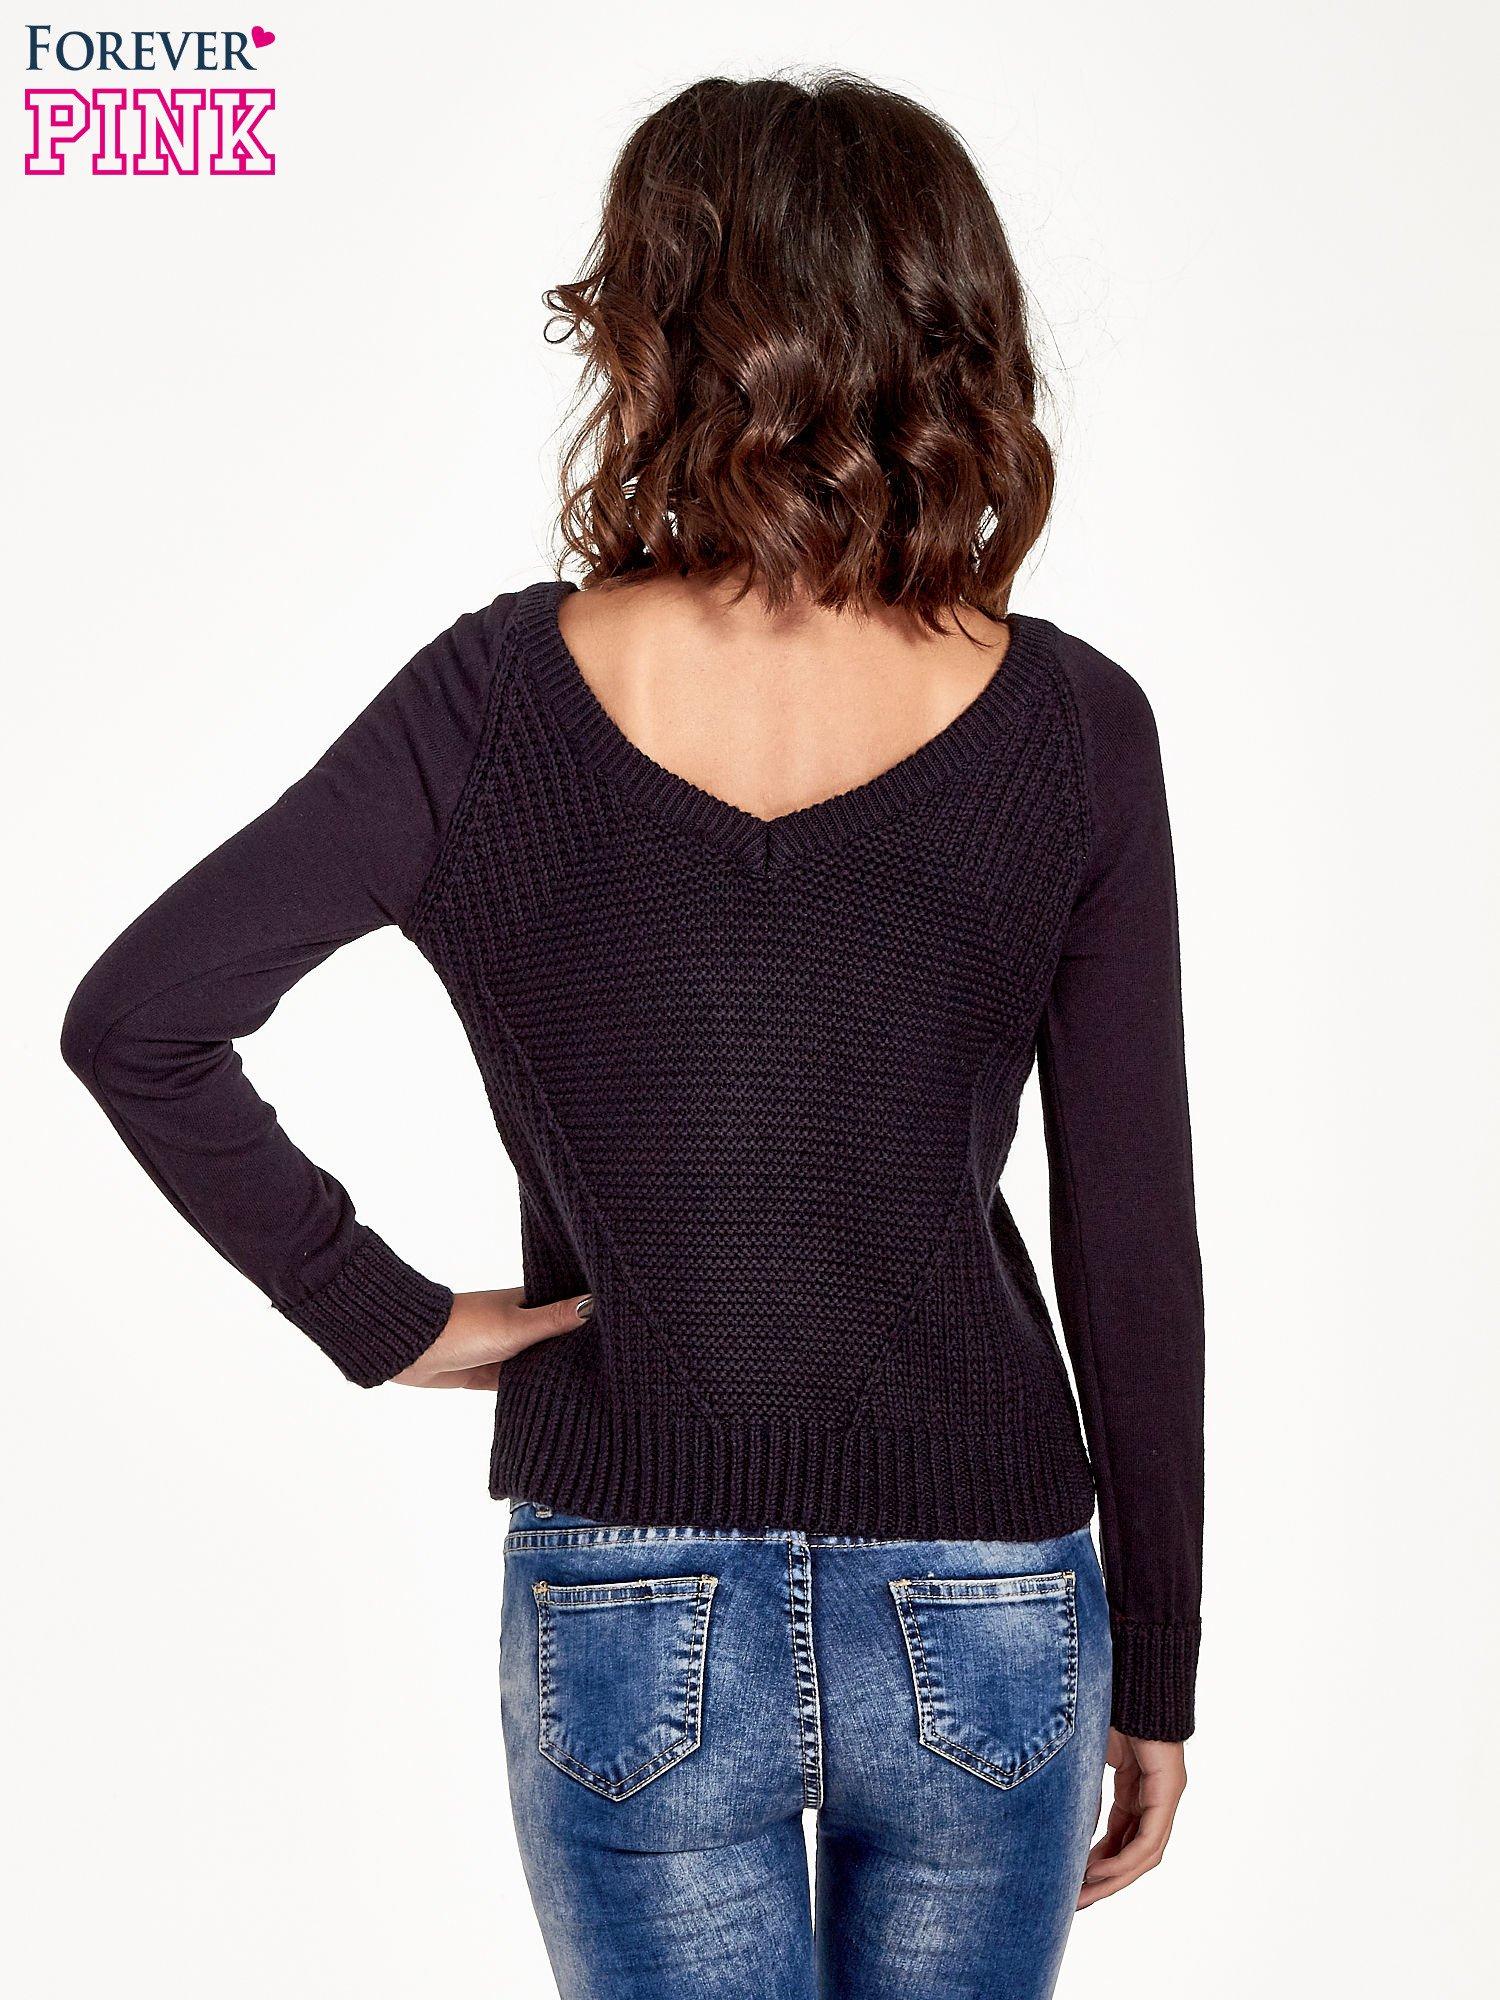 Granatowy sweter z dwustronnym dekoltem w serek                                  zdj.                                  4